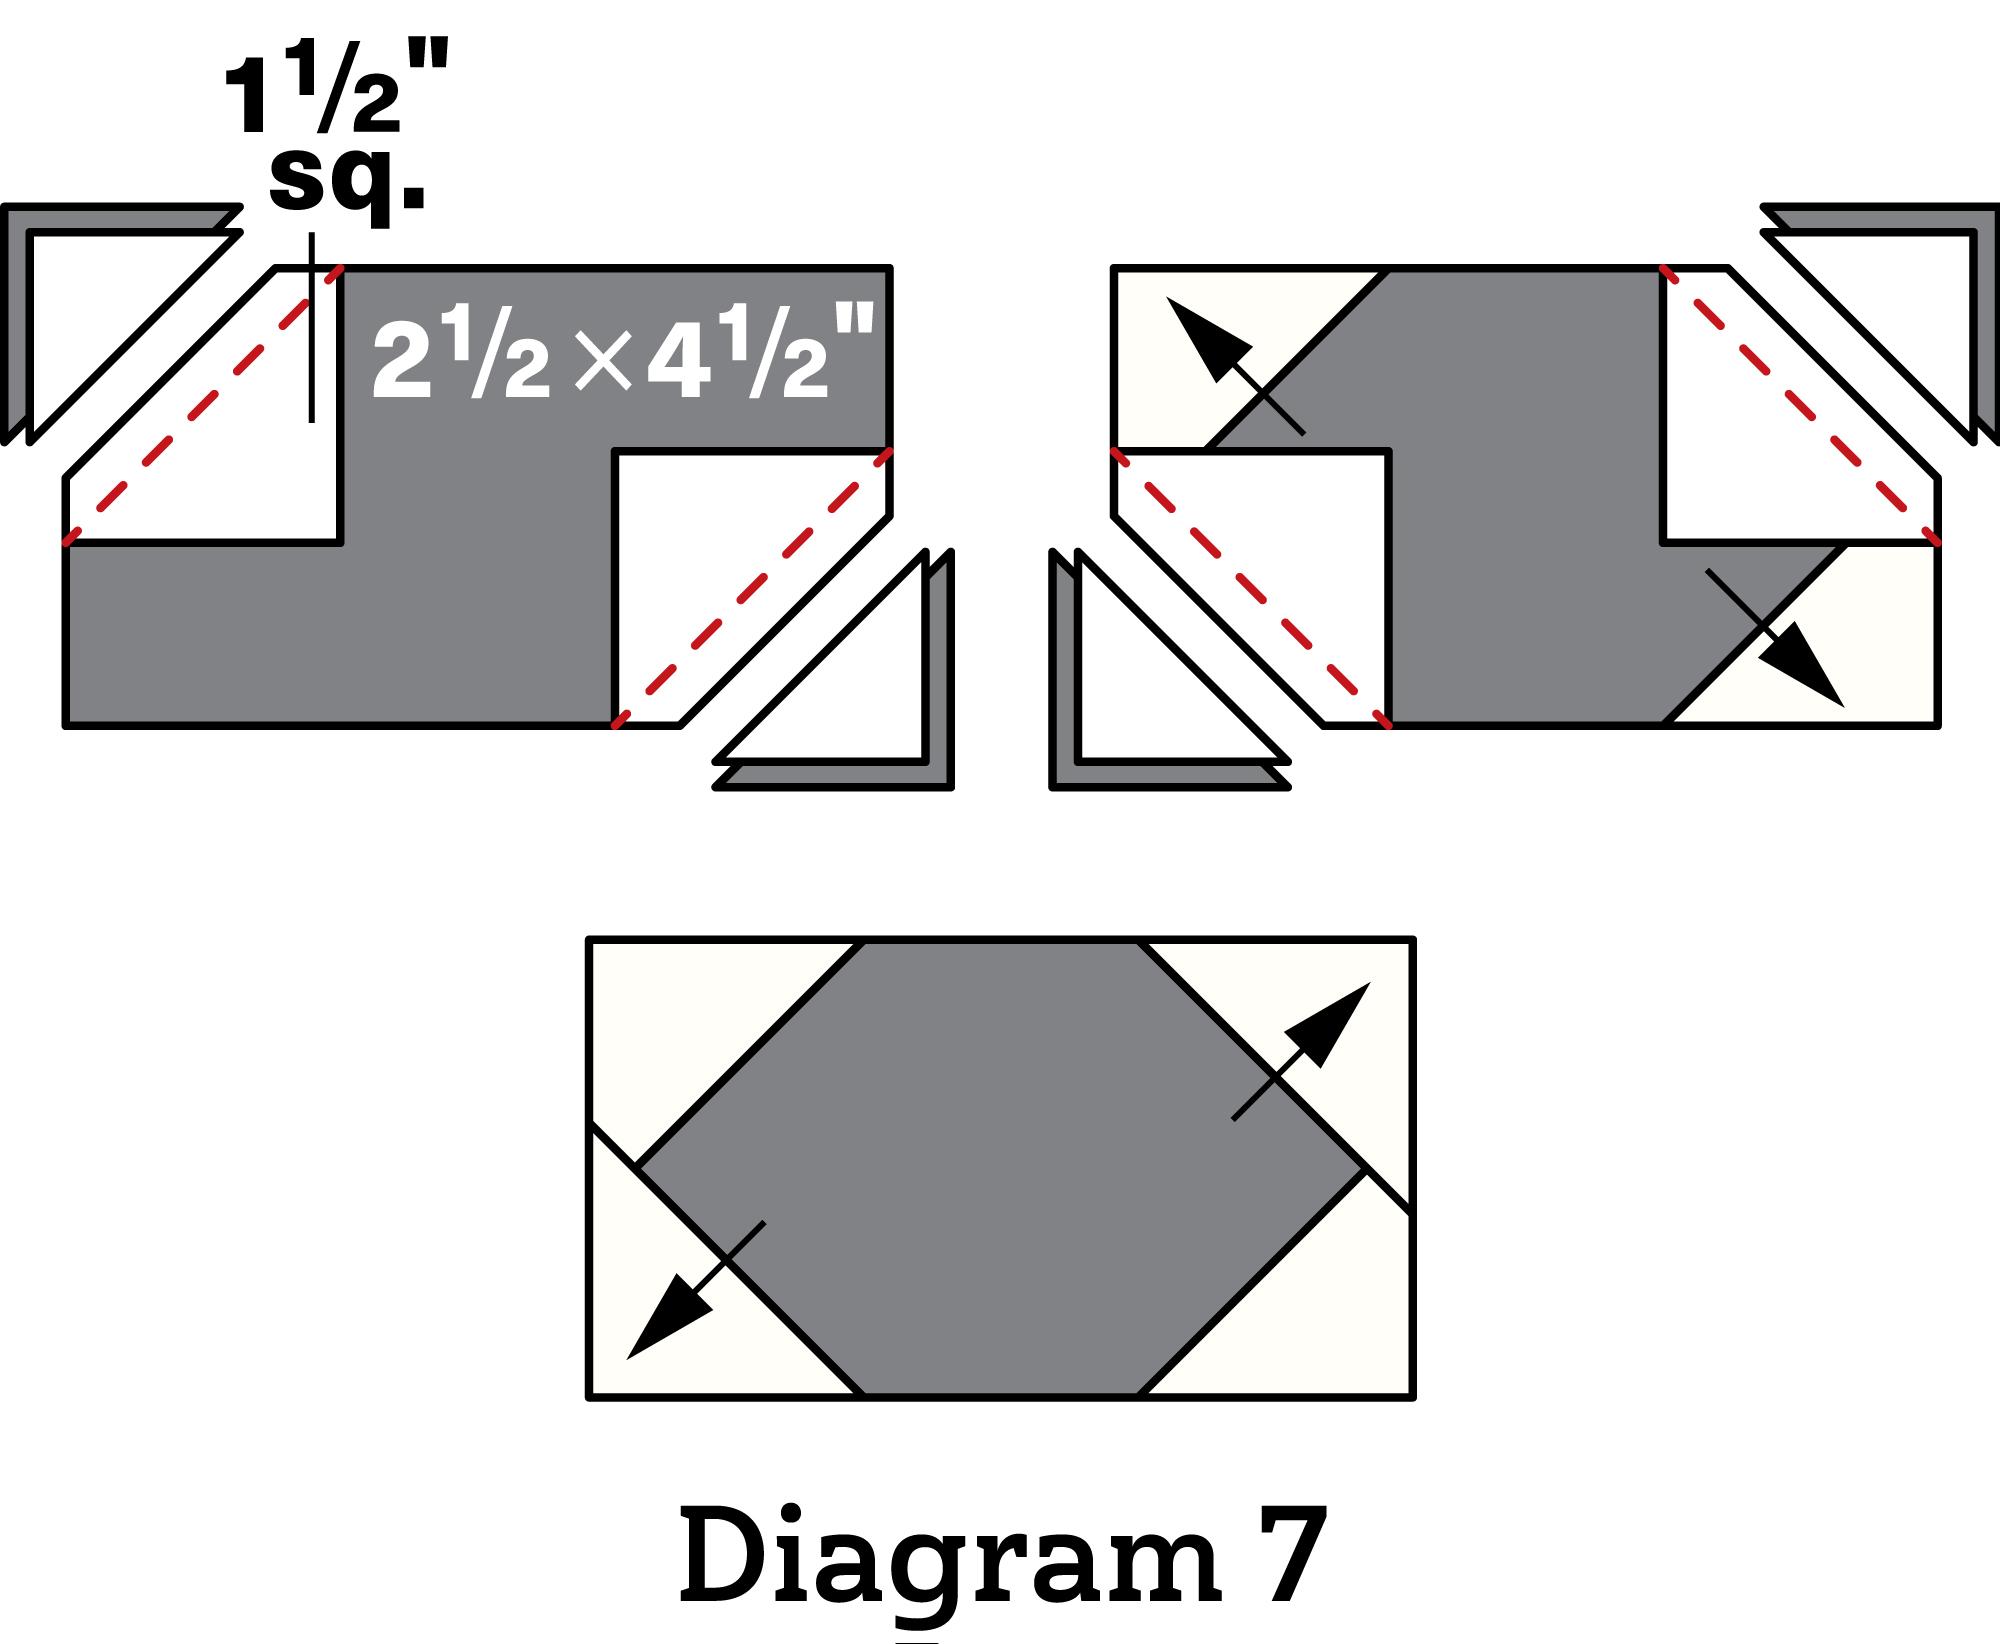 Good Tidings diagram 7